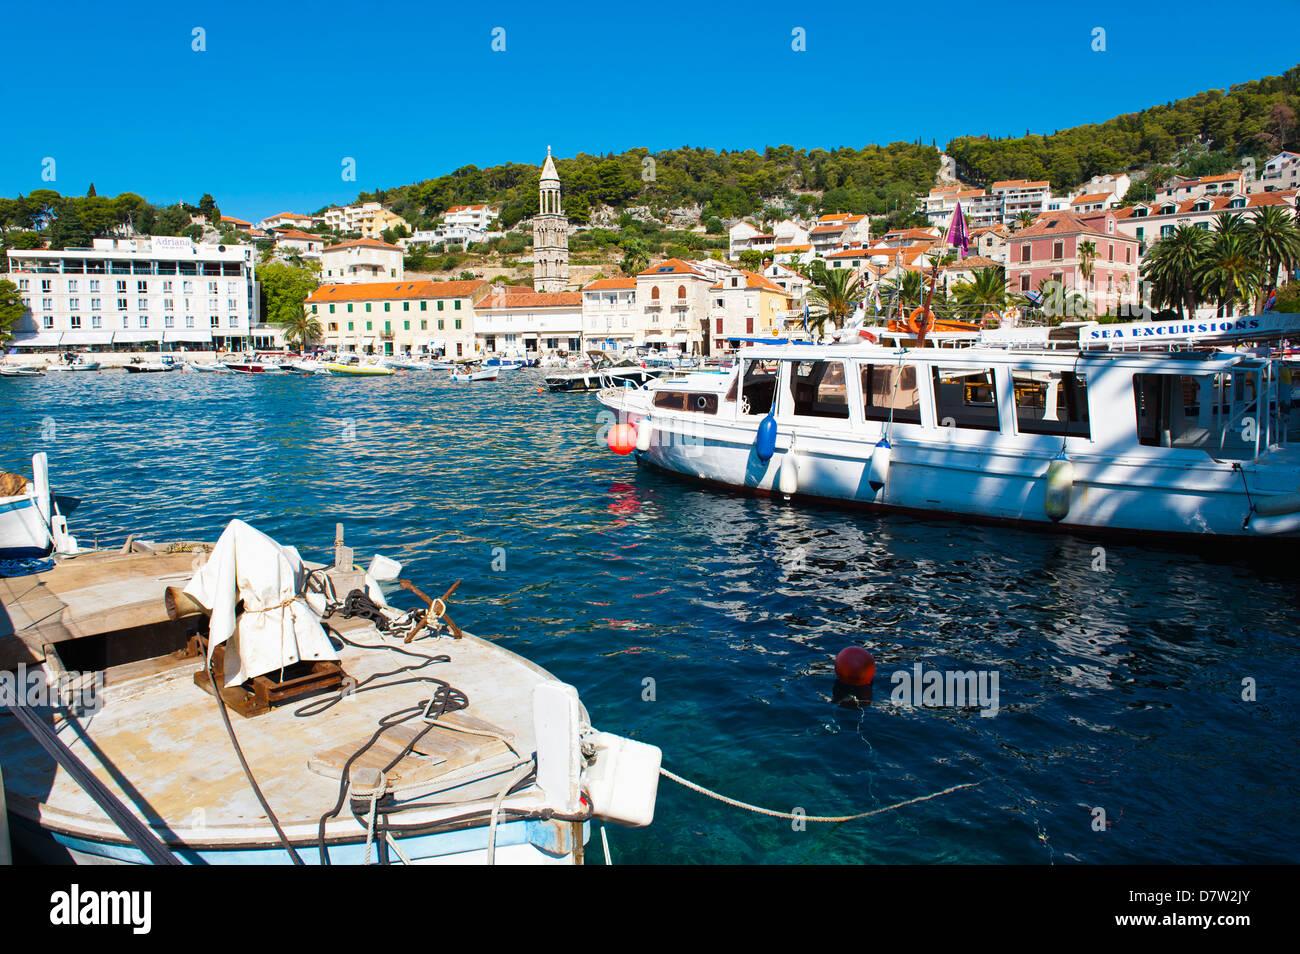 Hvar harbour, Hvar Island, Dalmatian Coast, Adriatic, Croatia - Stock Image